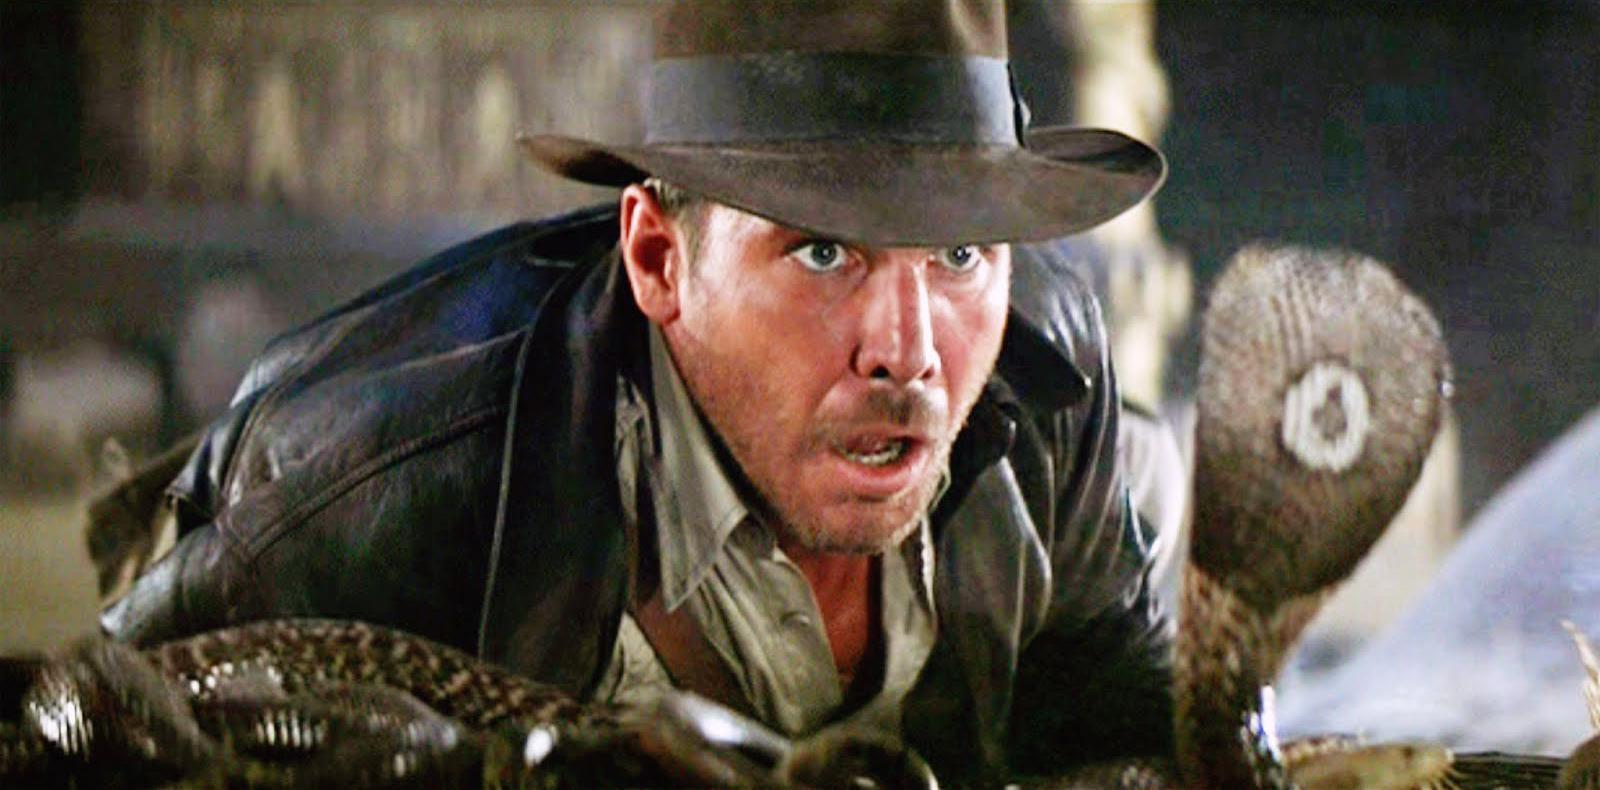 Disney Announces Fifth Indiana Jones Film Starring Harrison Ford